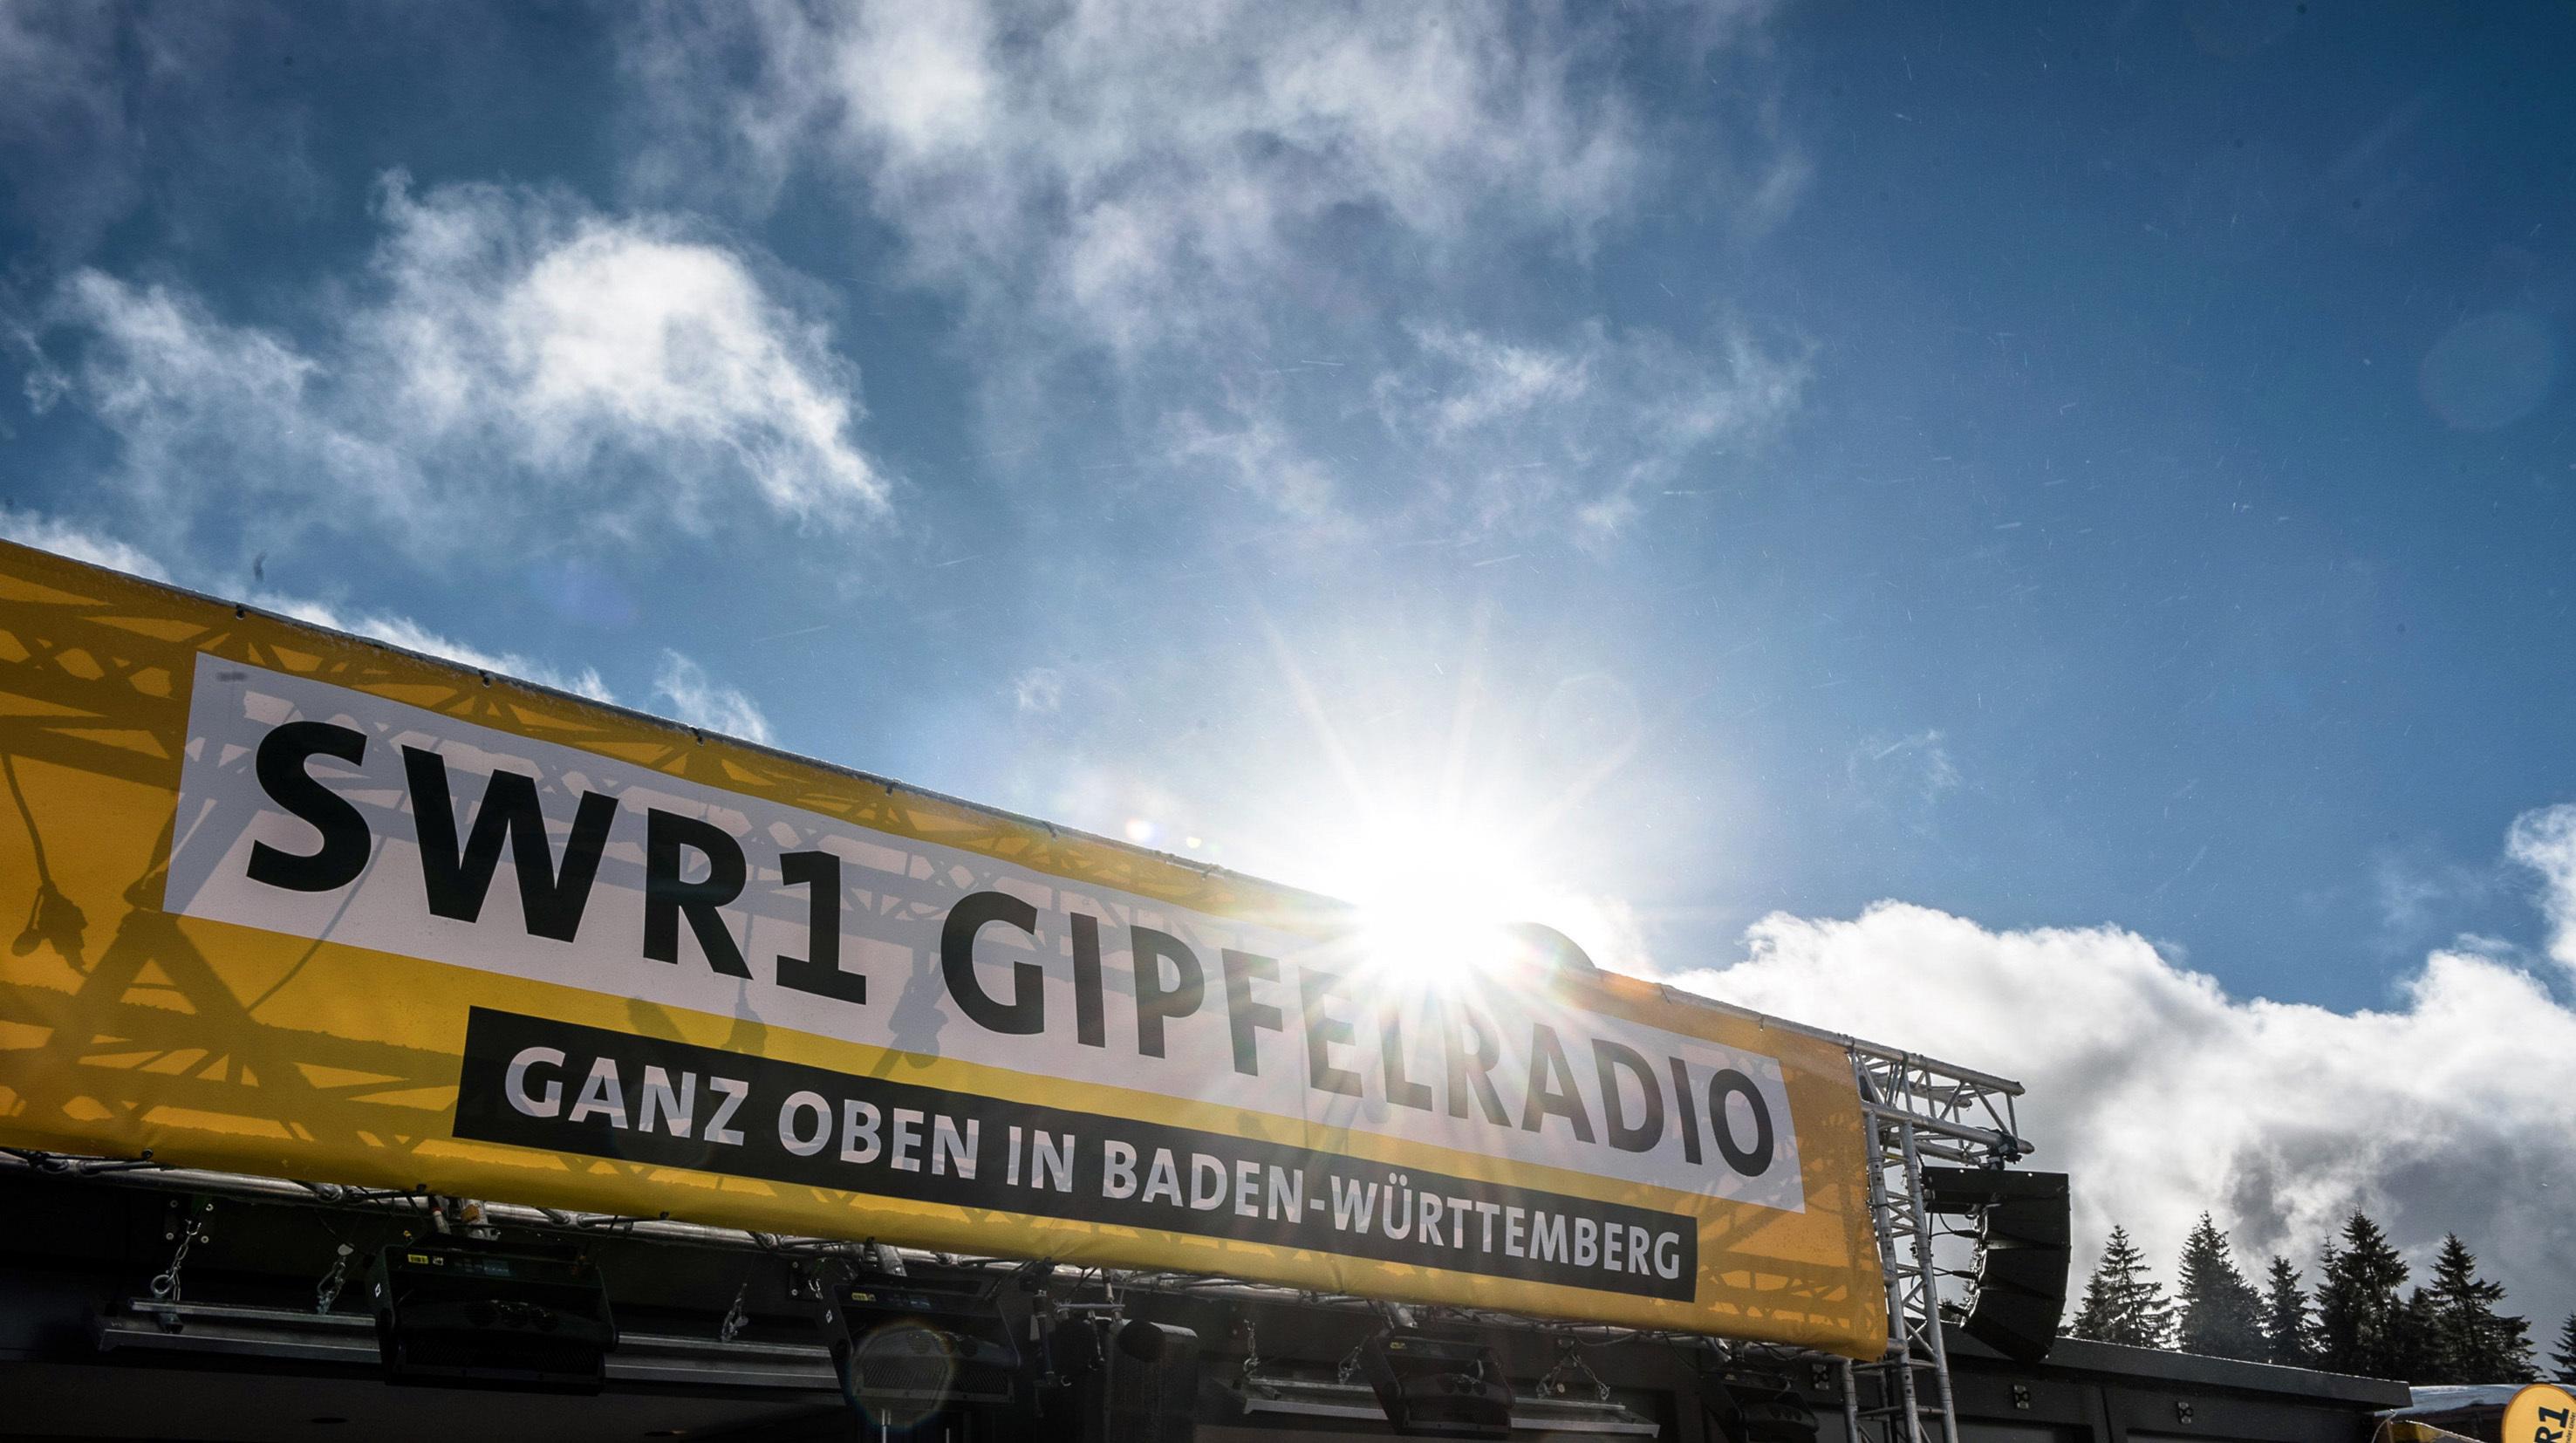 Radio Swr 1